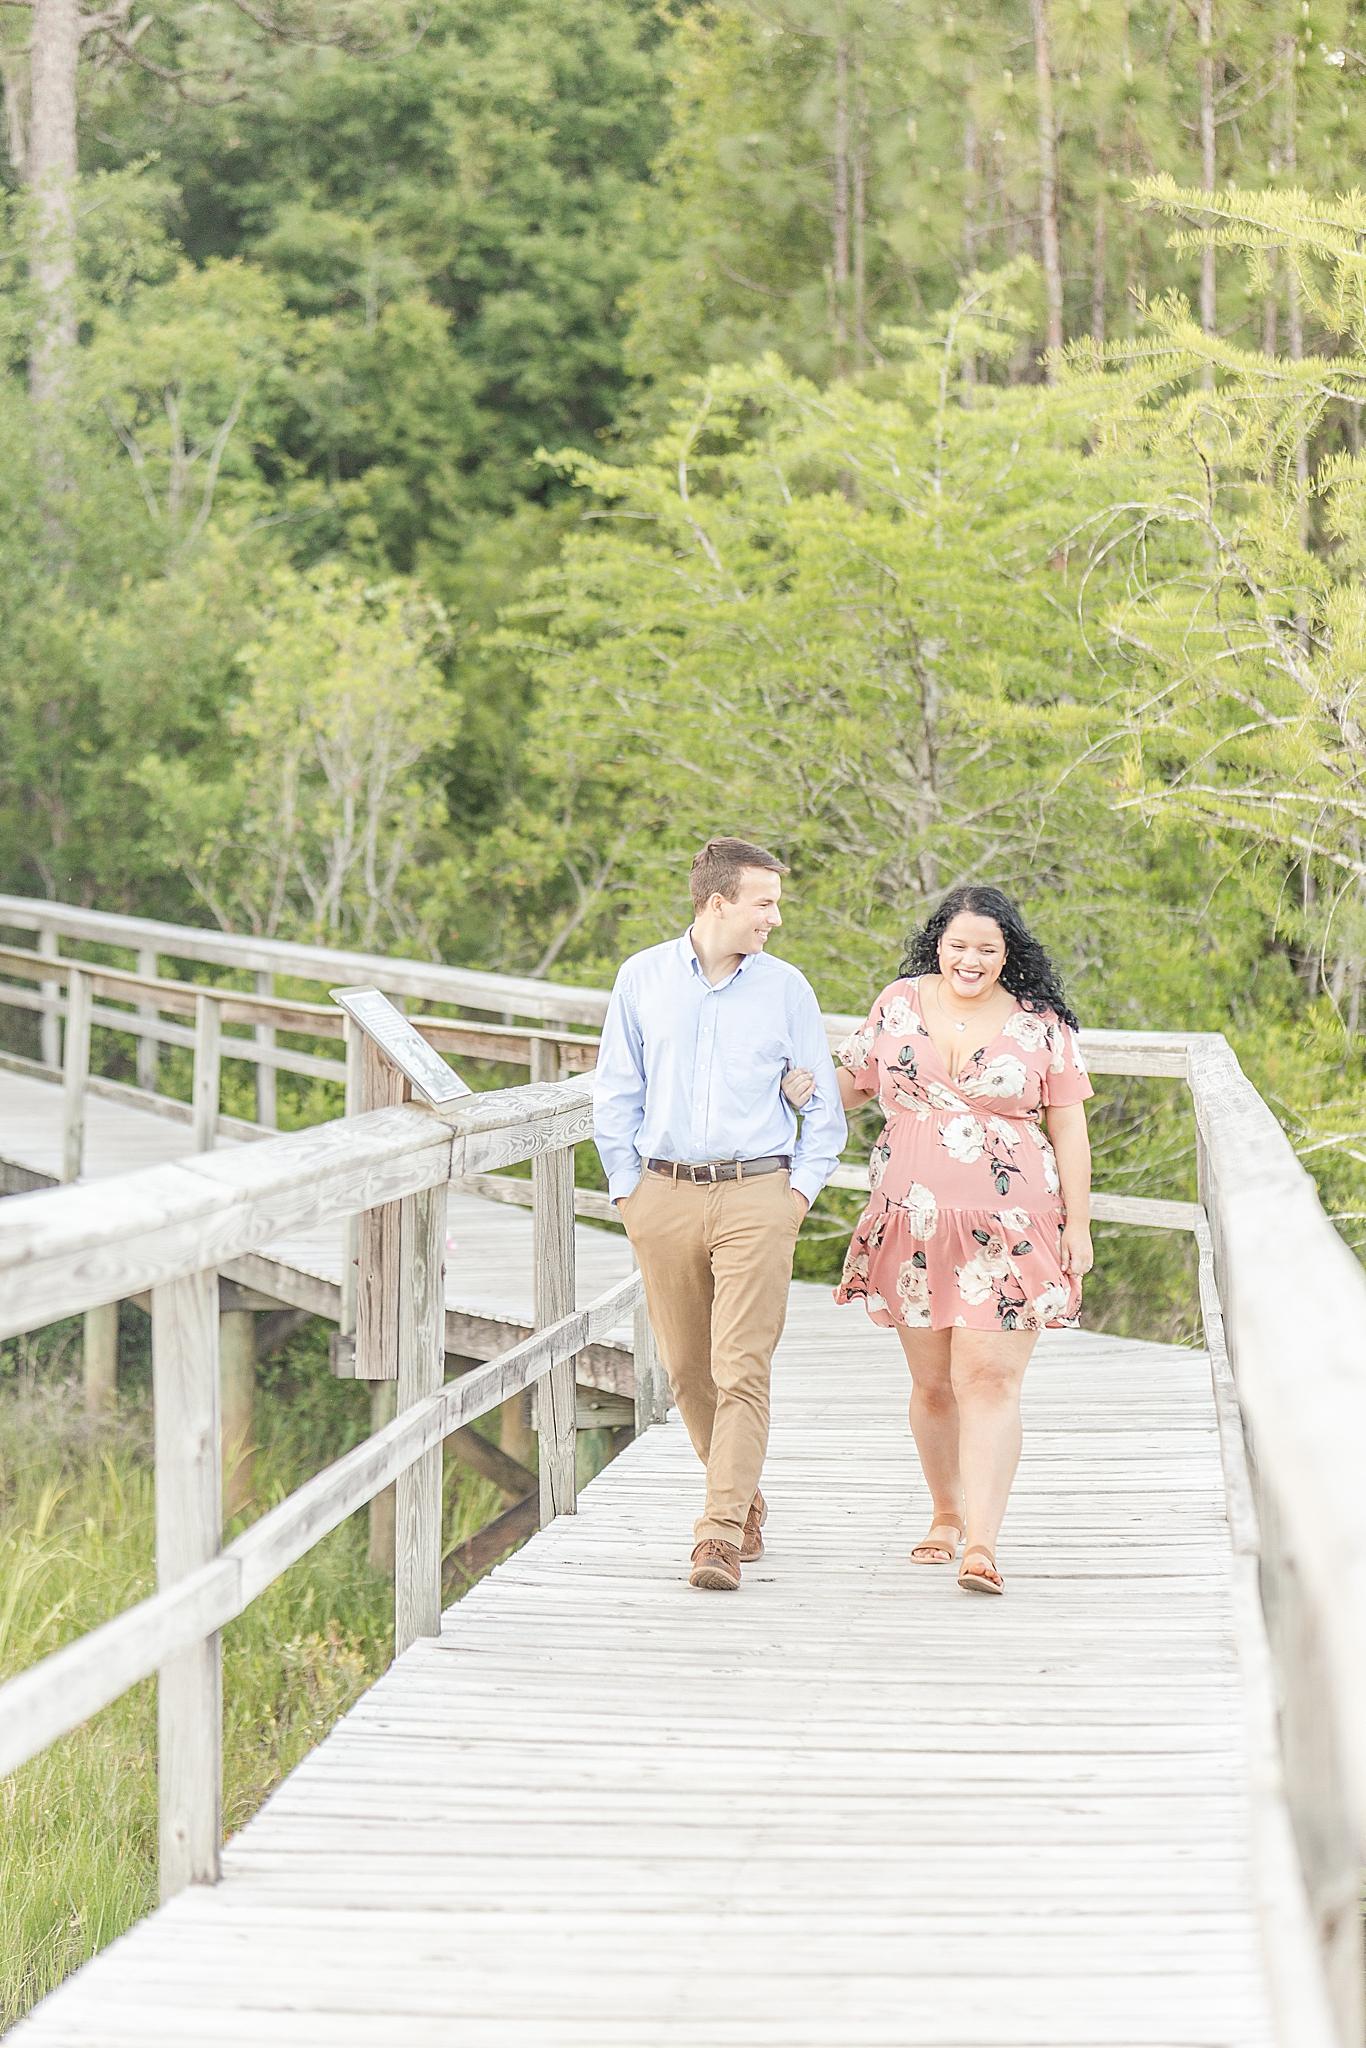 couple walks on bridge in Fairhope AL during engagement photos